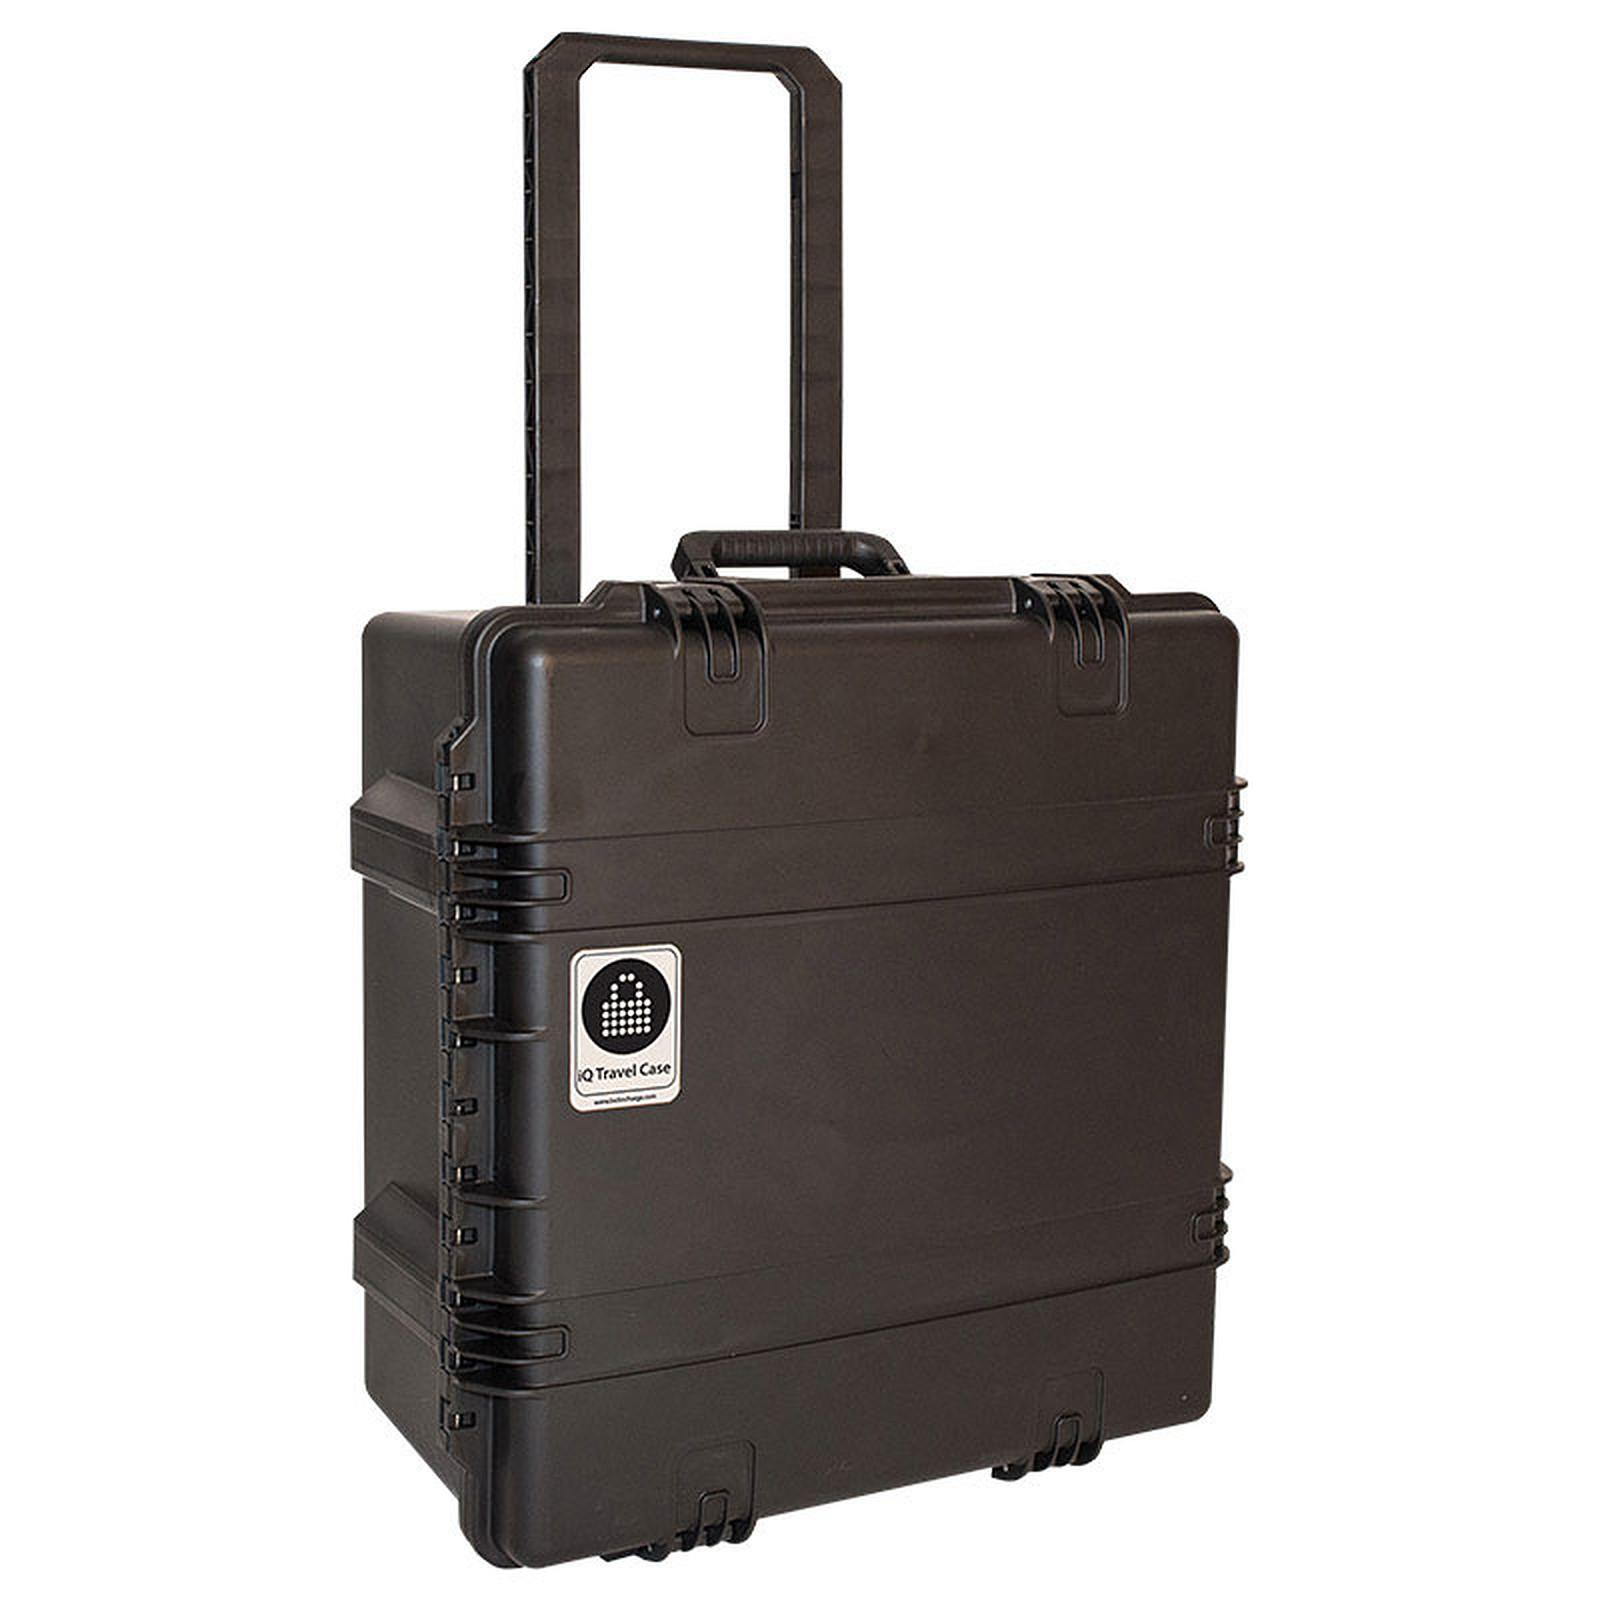 Lockncharge iQ Travel Case 20